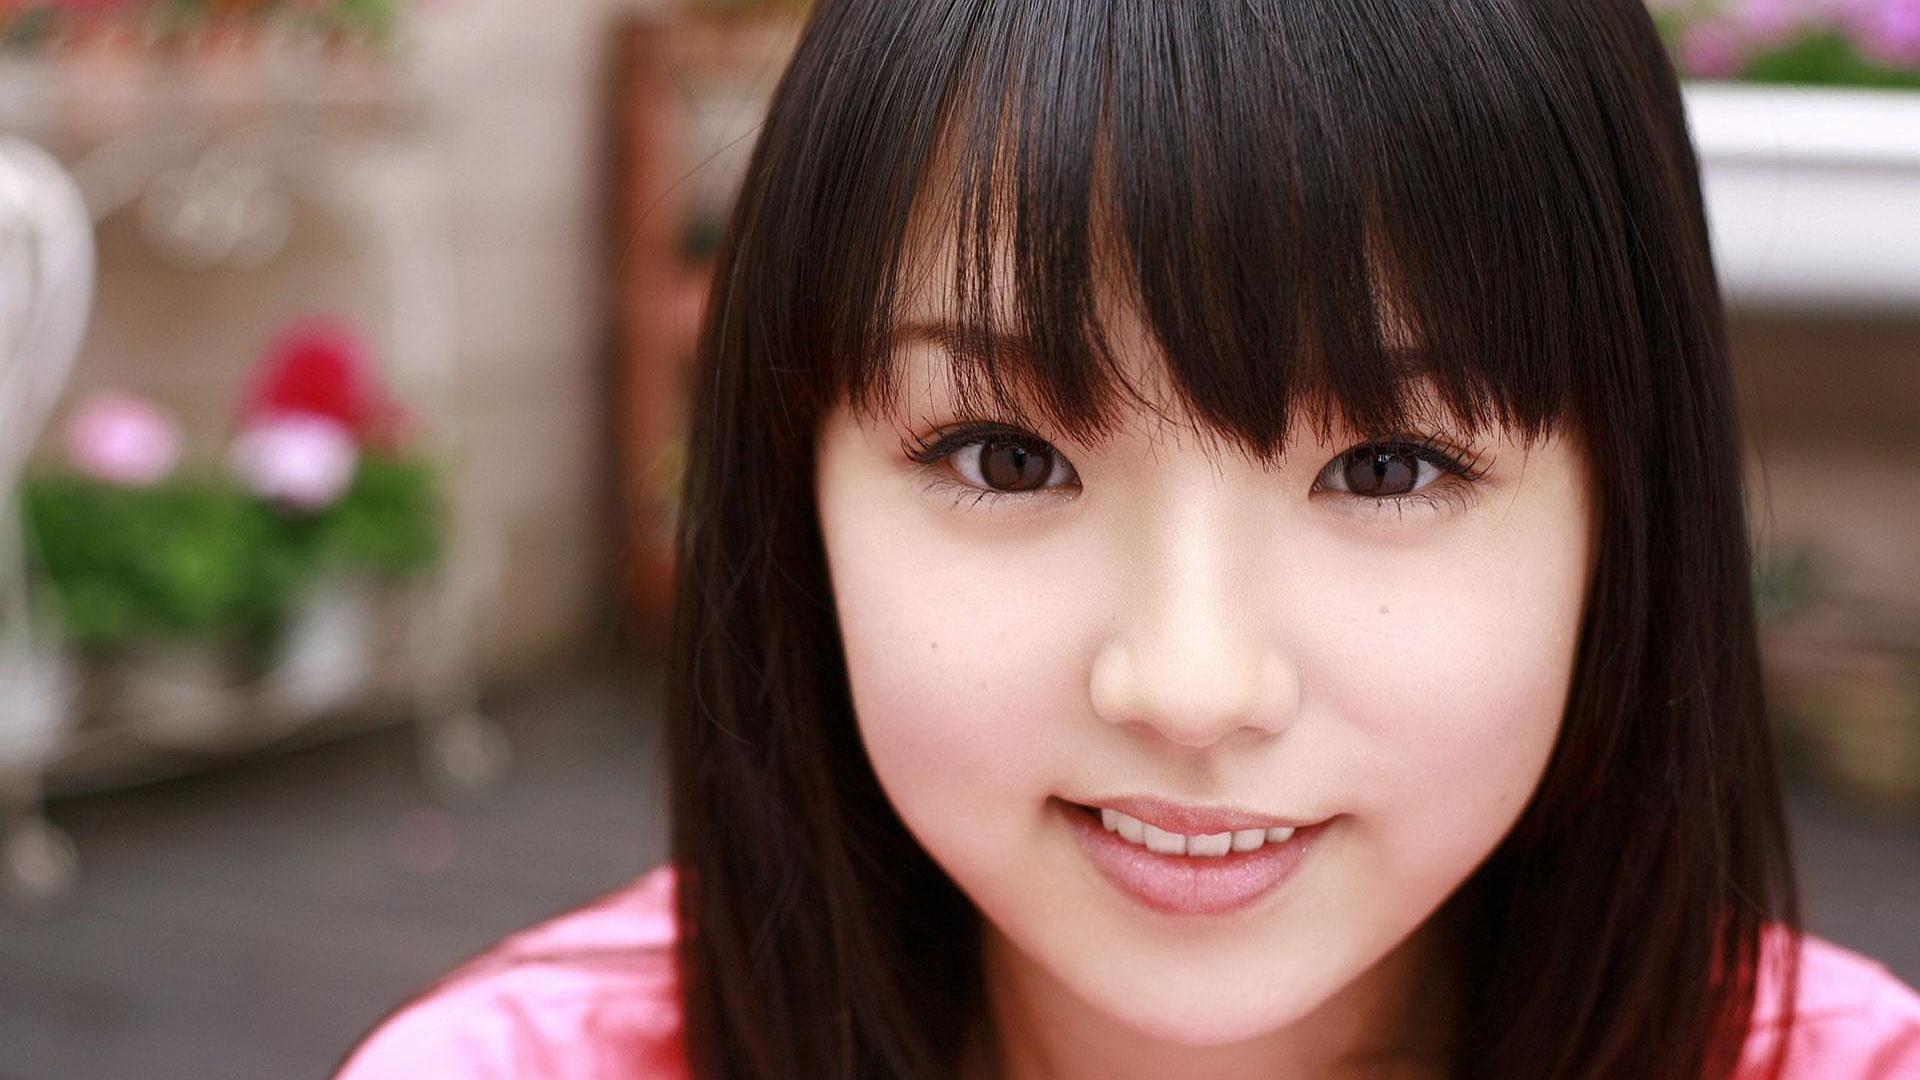 japanese-girl-feelings-pinay-teens-nude-pics-free-downloads